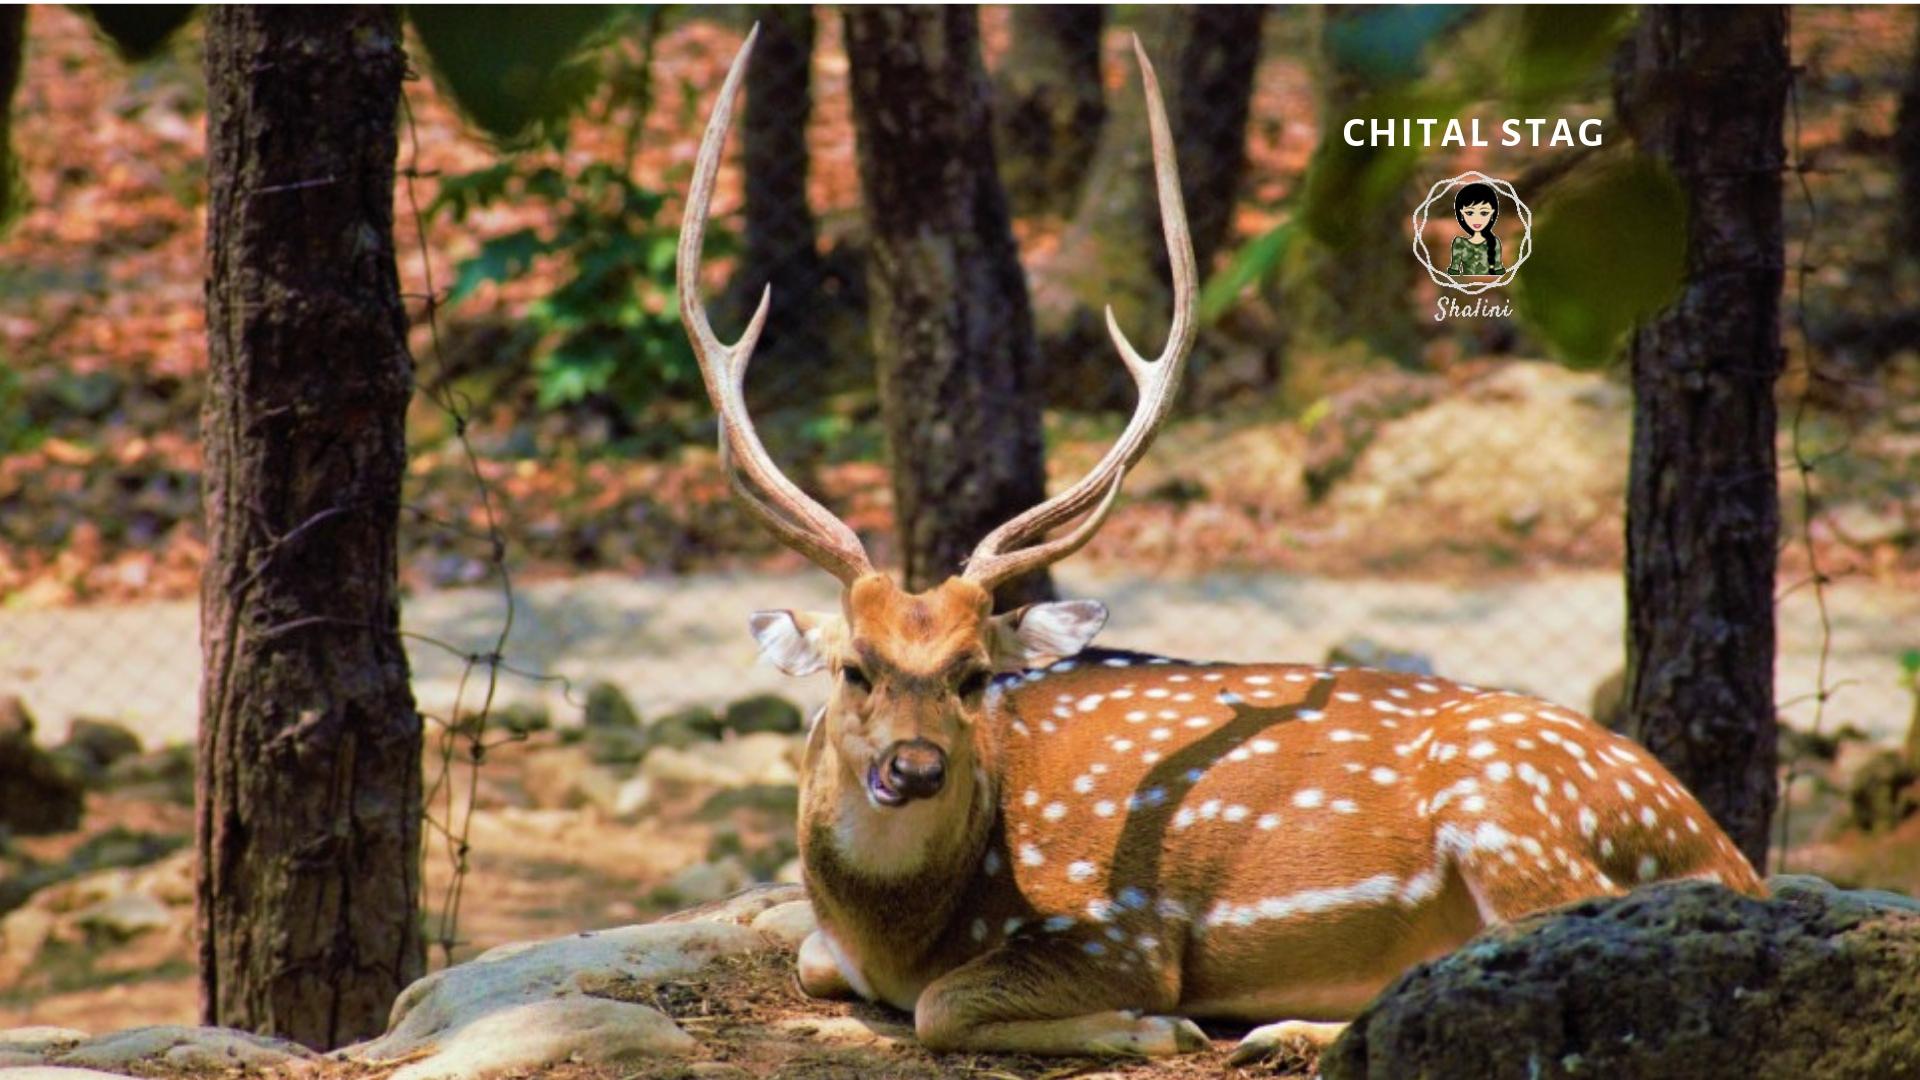 Chital deer fauna uttarakhand garhwal kohleyedme.com